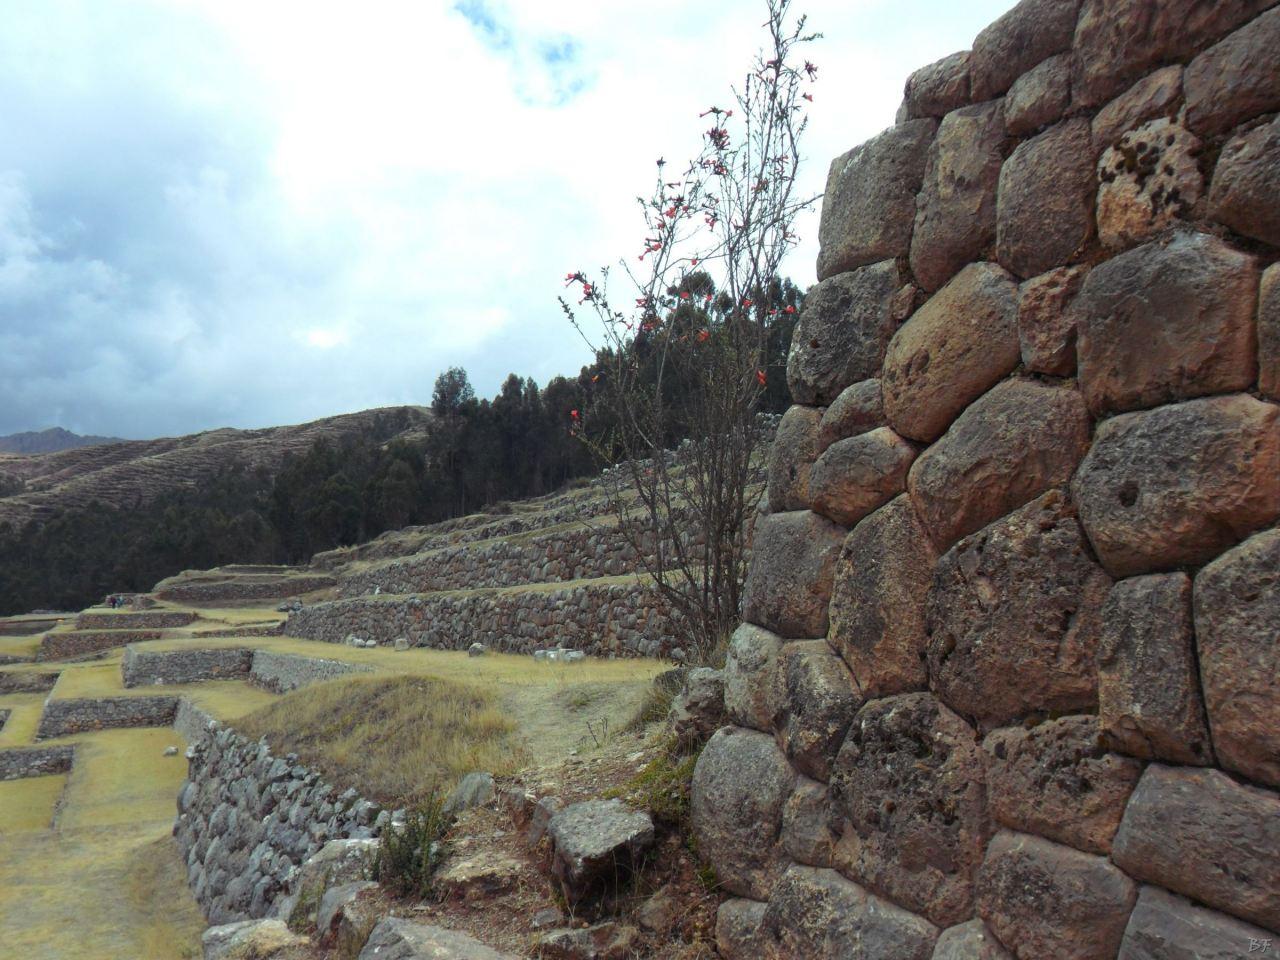 Chinchero-Mura-Poligonali-Piramide-Urubamba-Peru-86